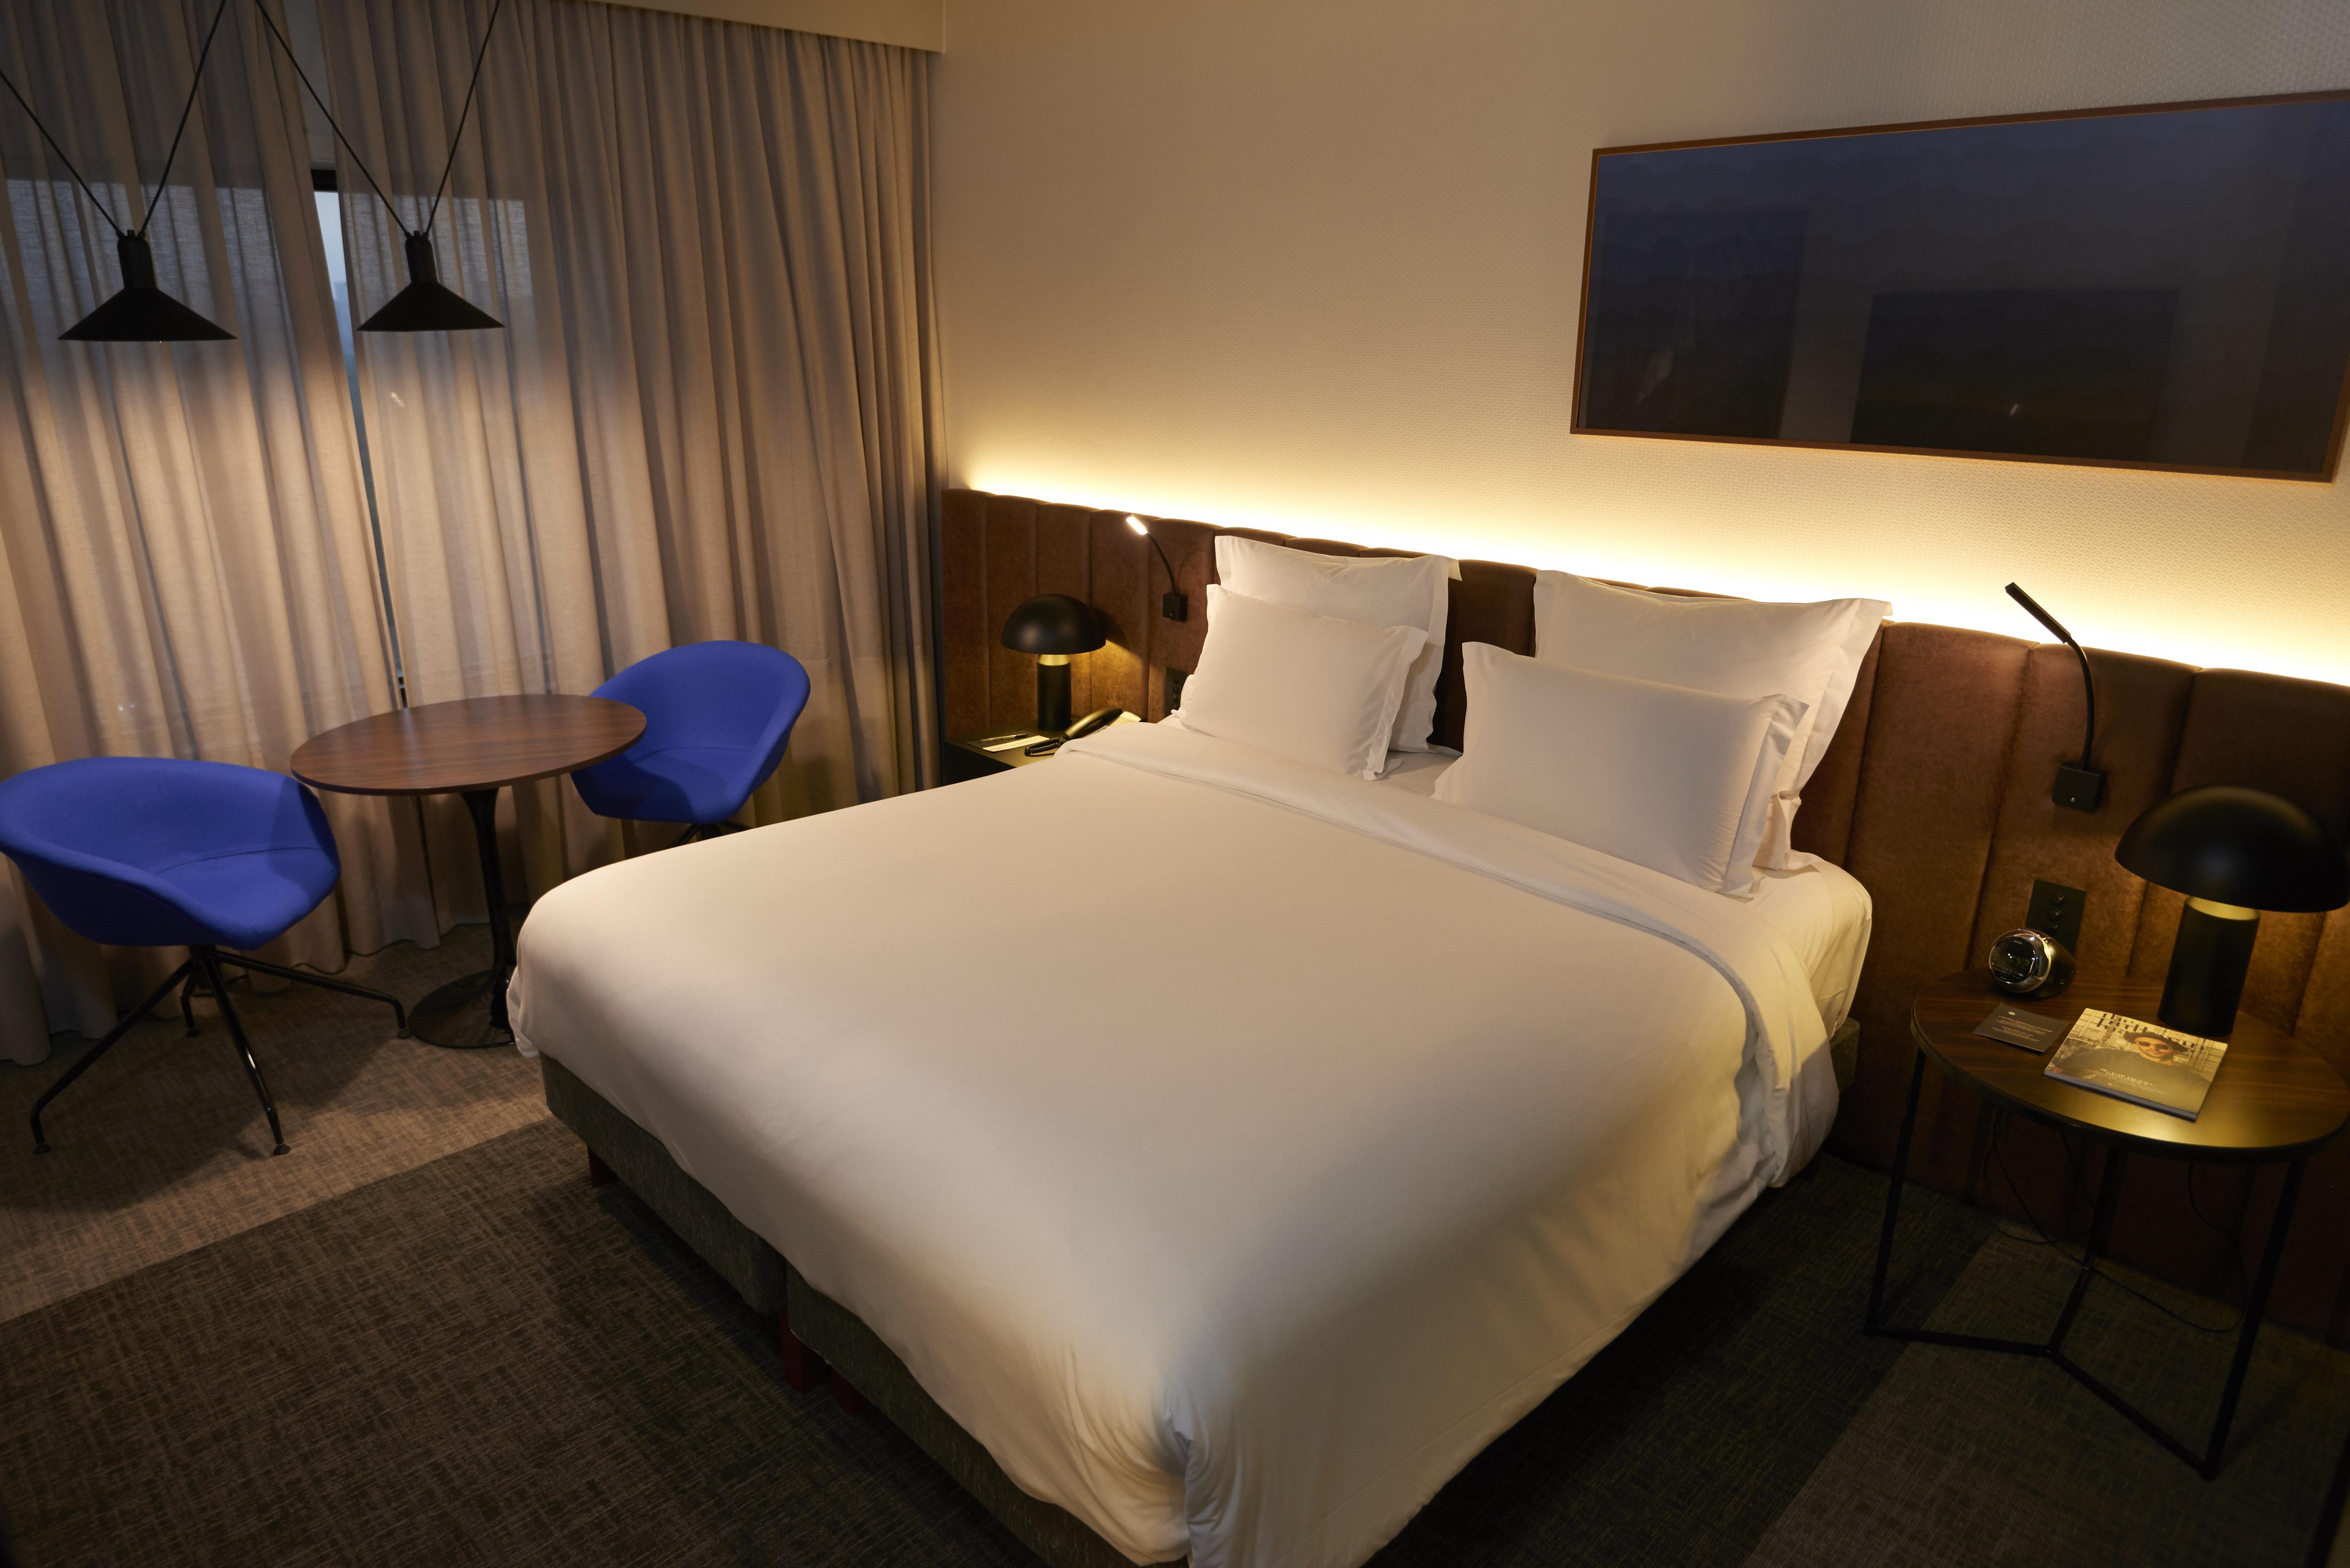 pullman hotel sp